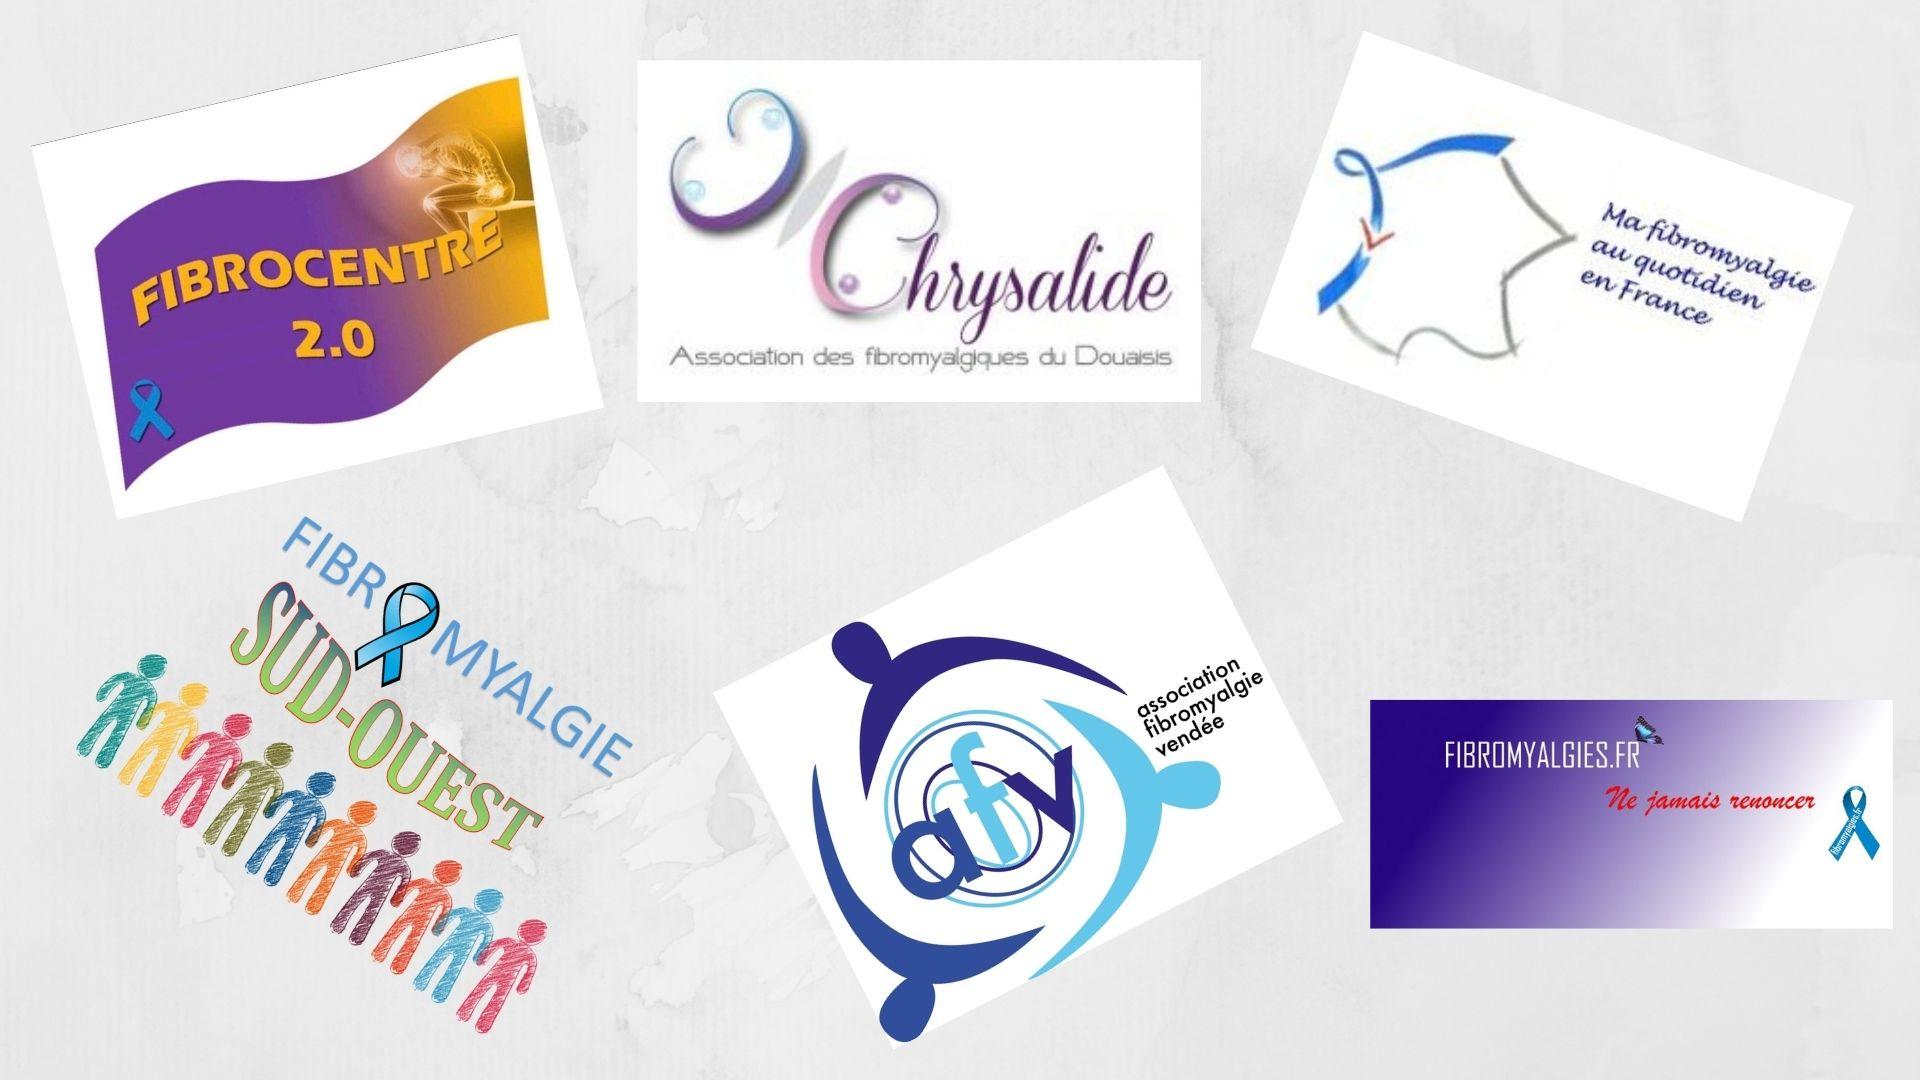 Journée mondiale de la fibromyalgie 2021